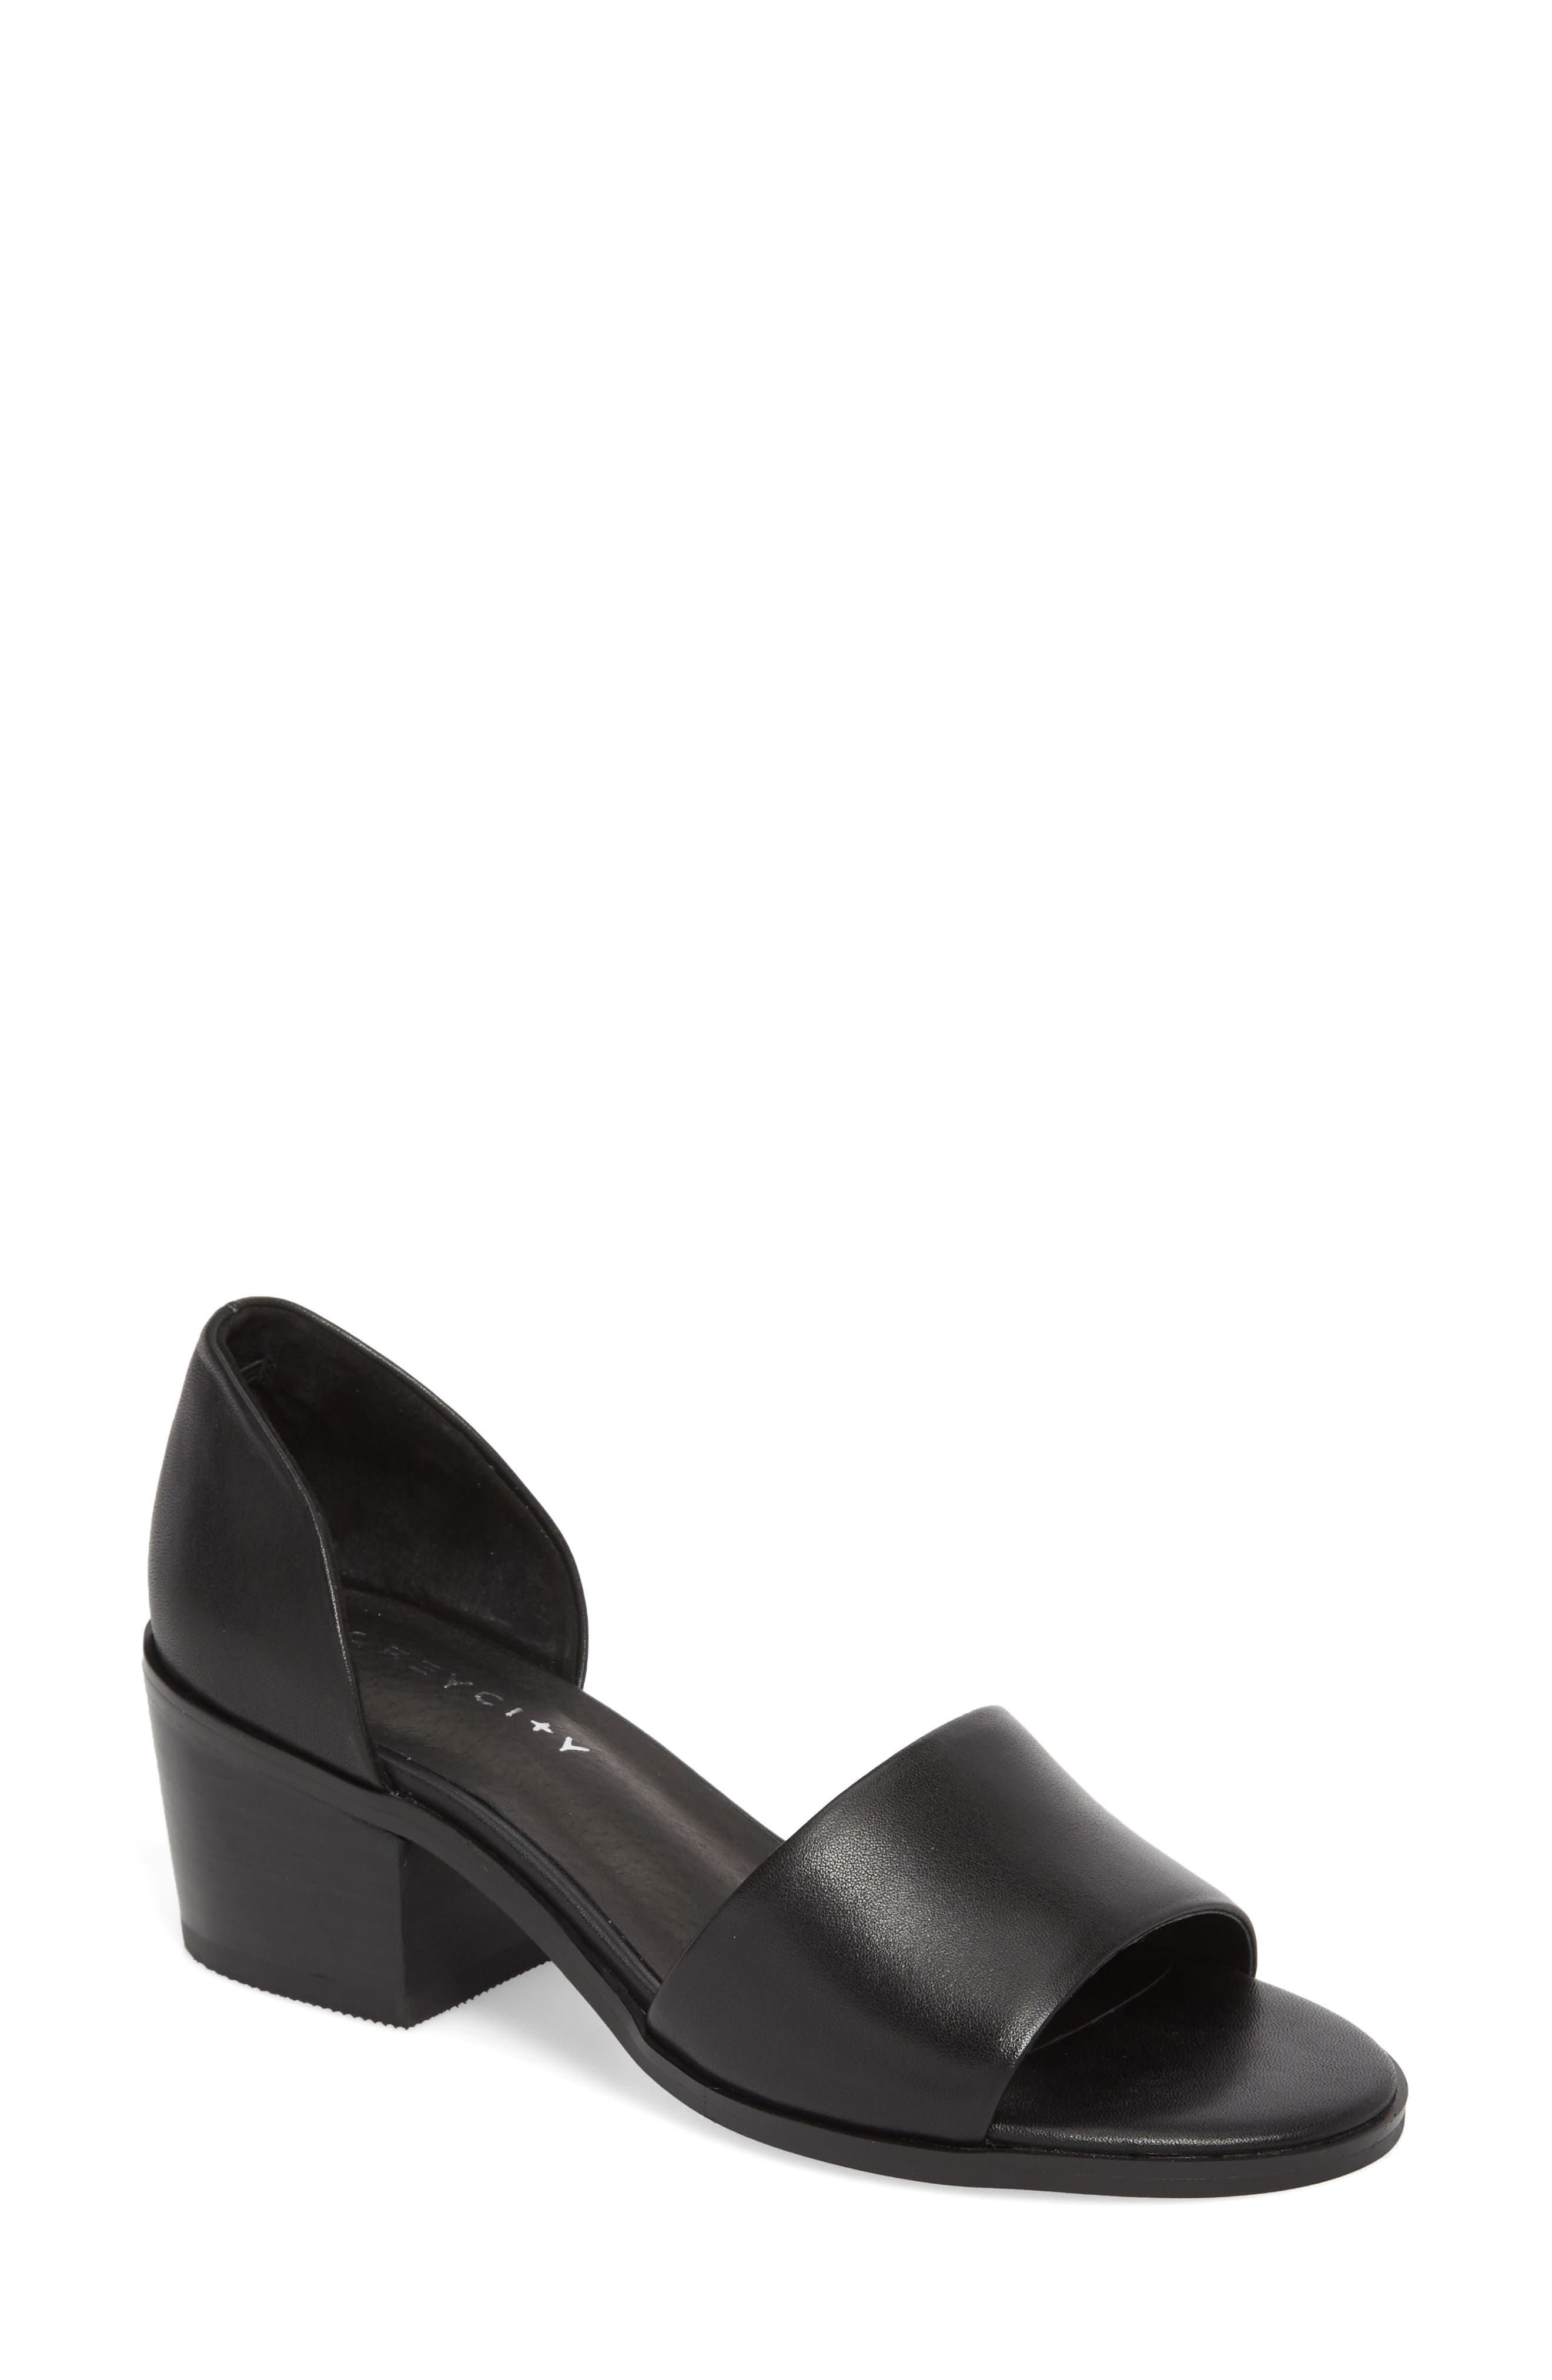 Ditty Sandal,                         Main,                         color, Black